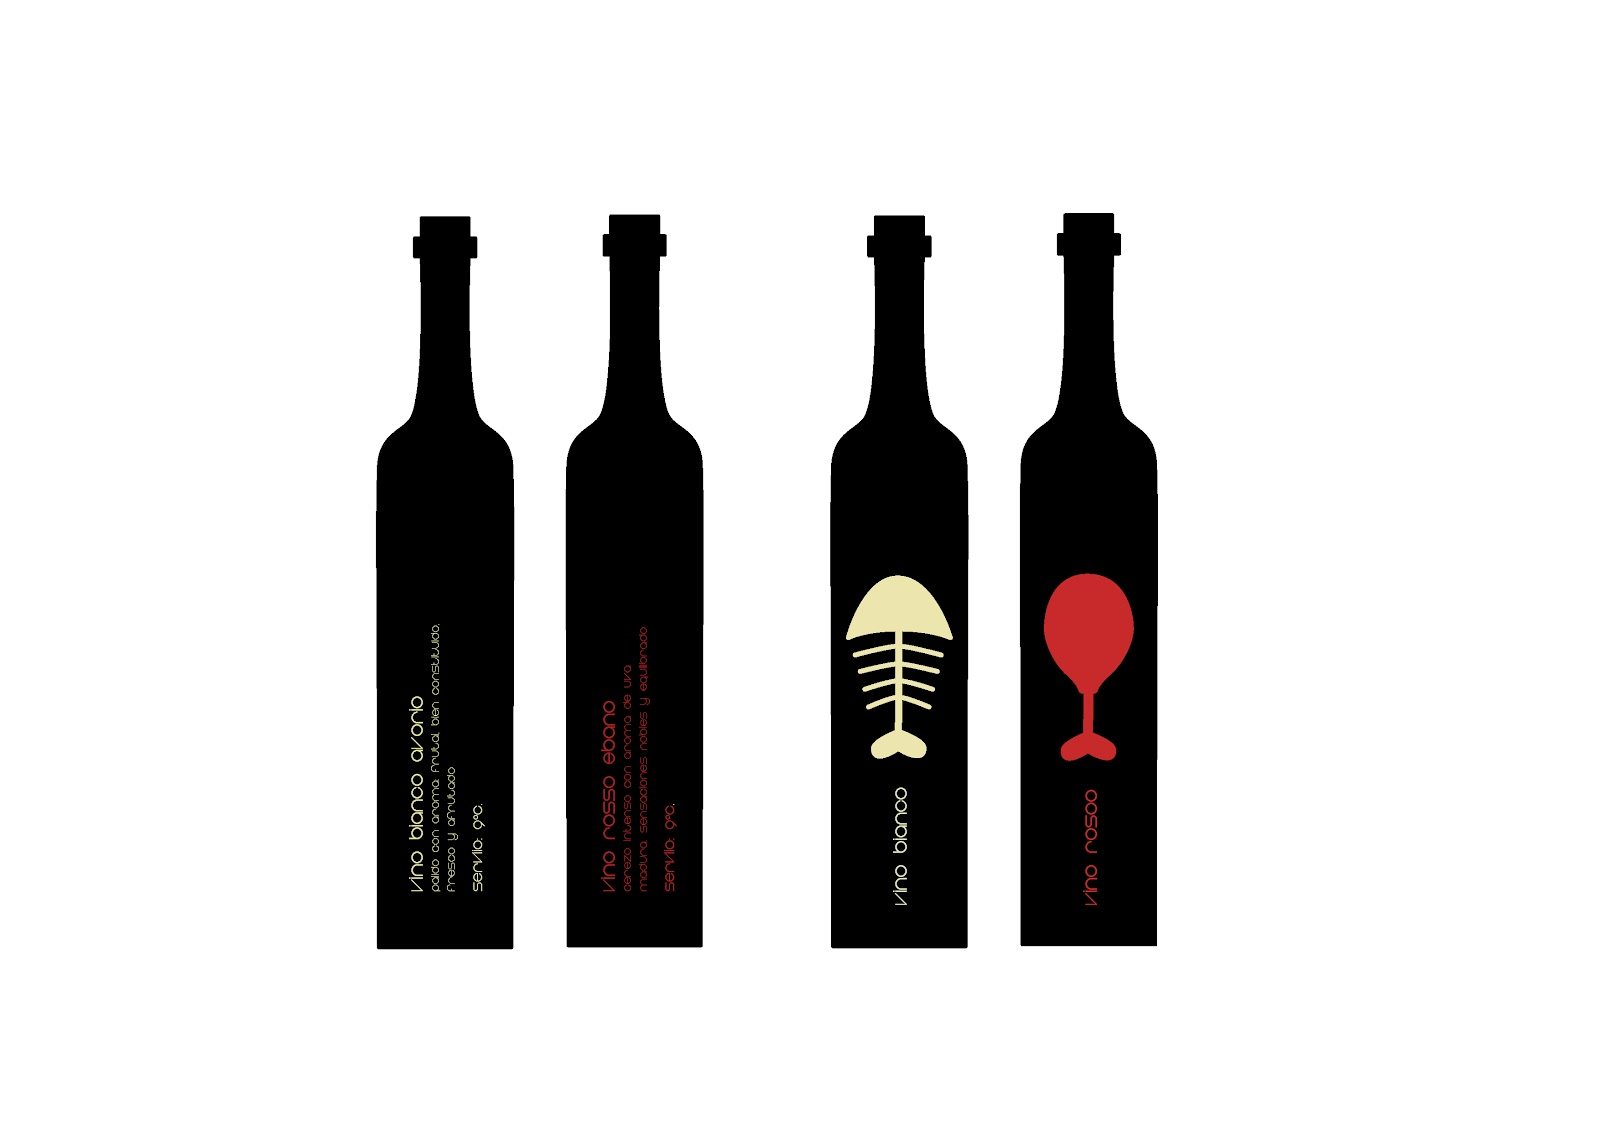 Logos De Botellas Pictures To Pin On Pinterest